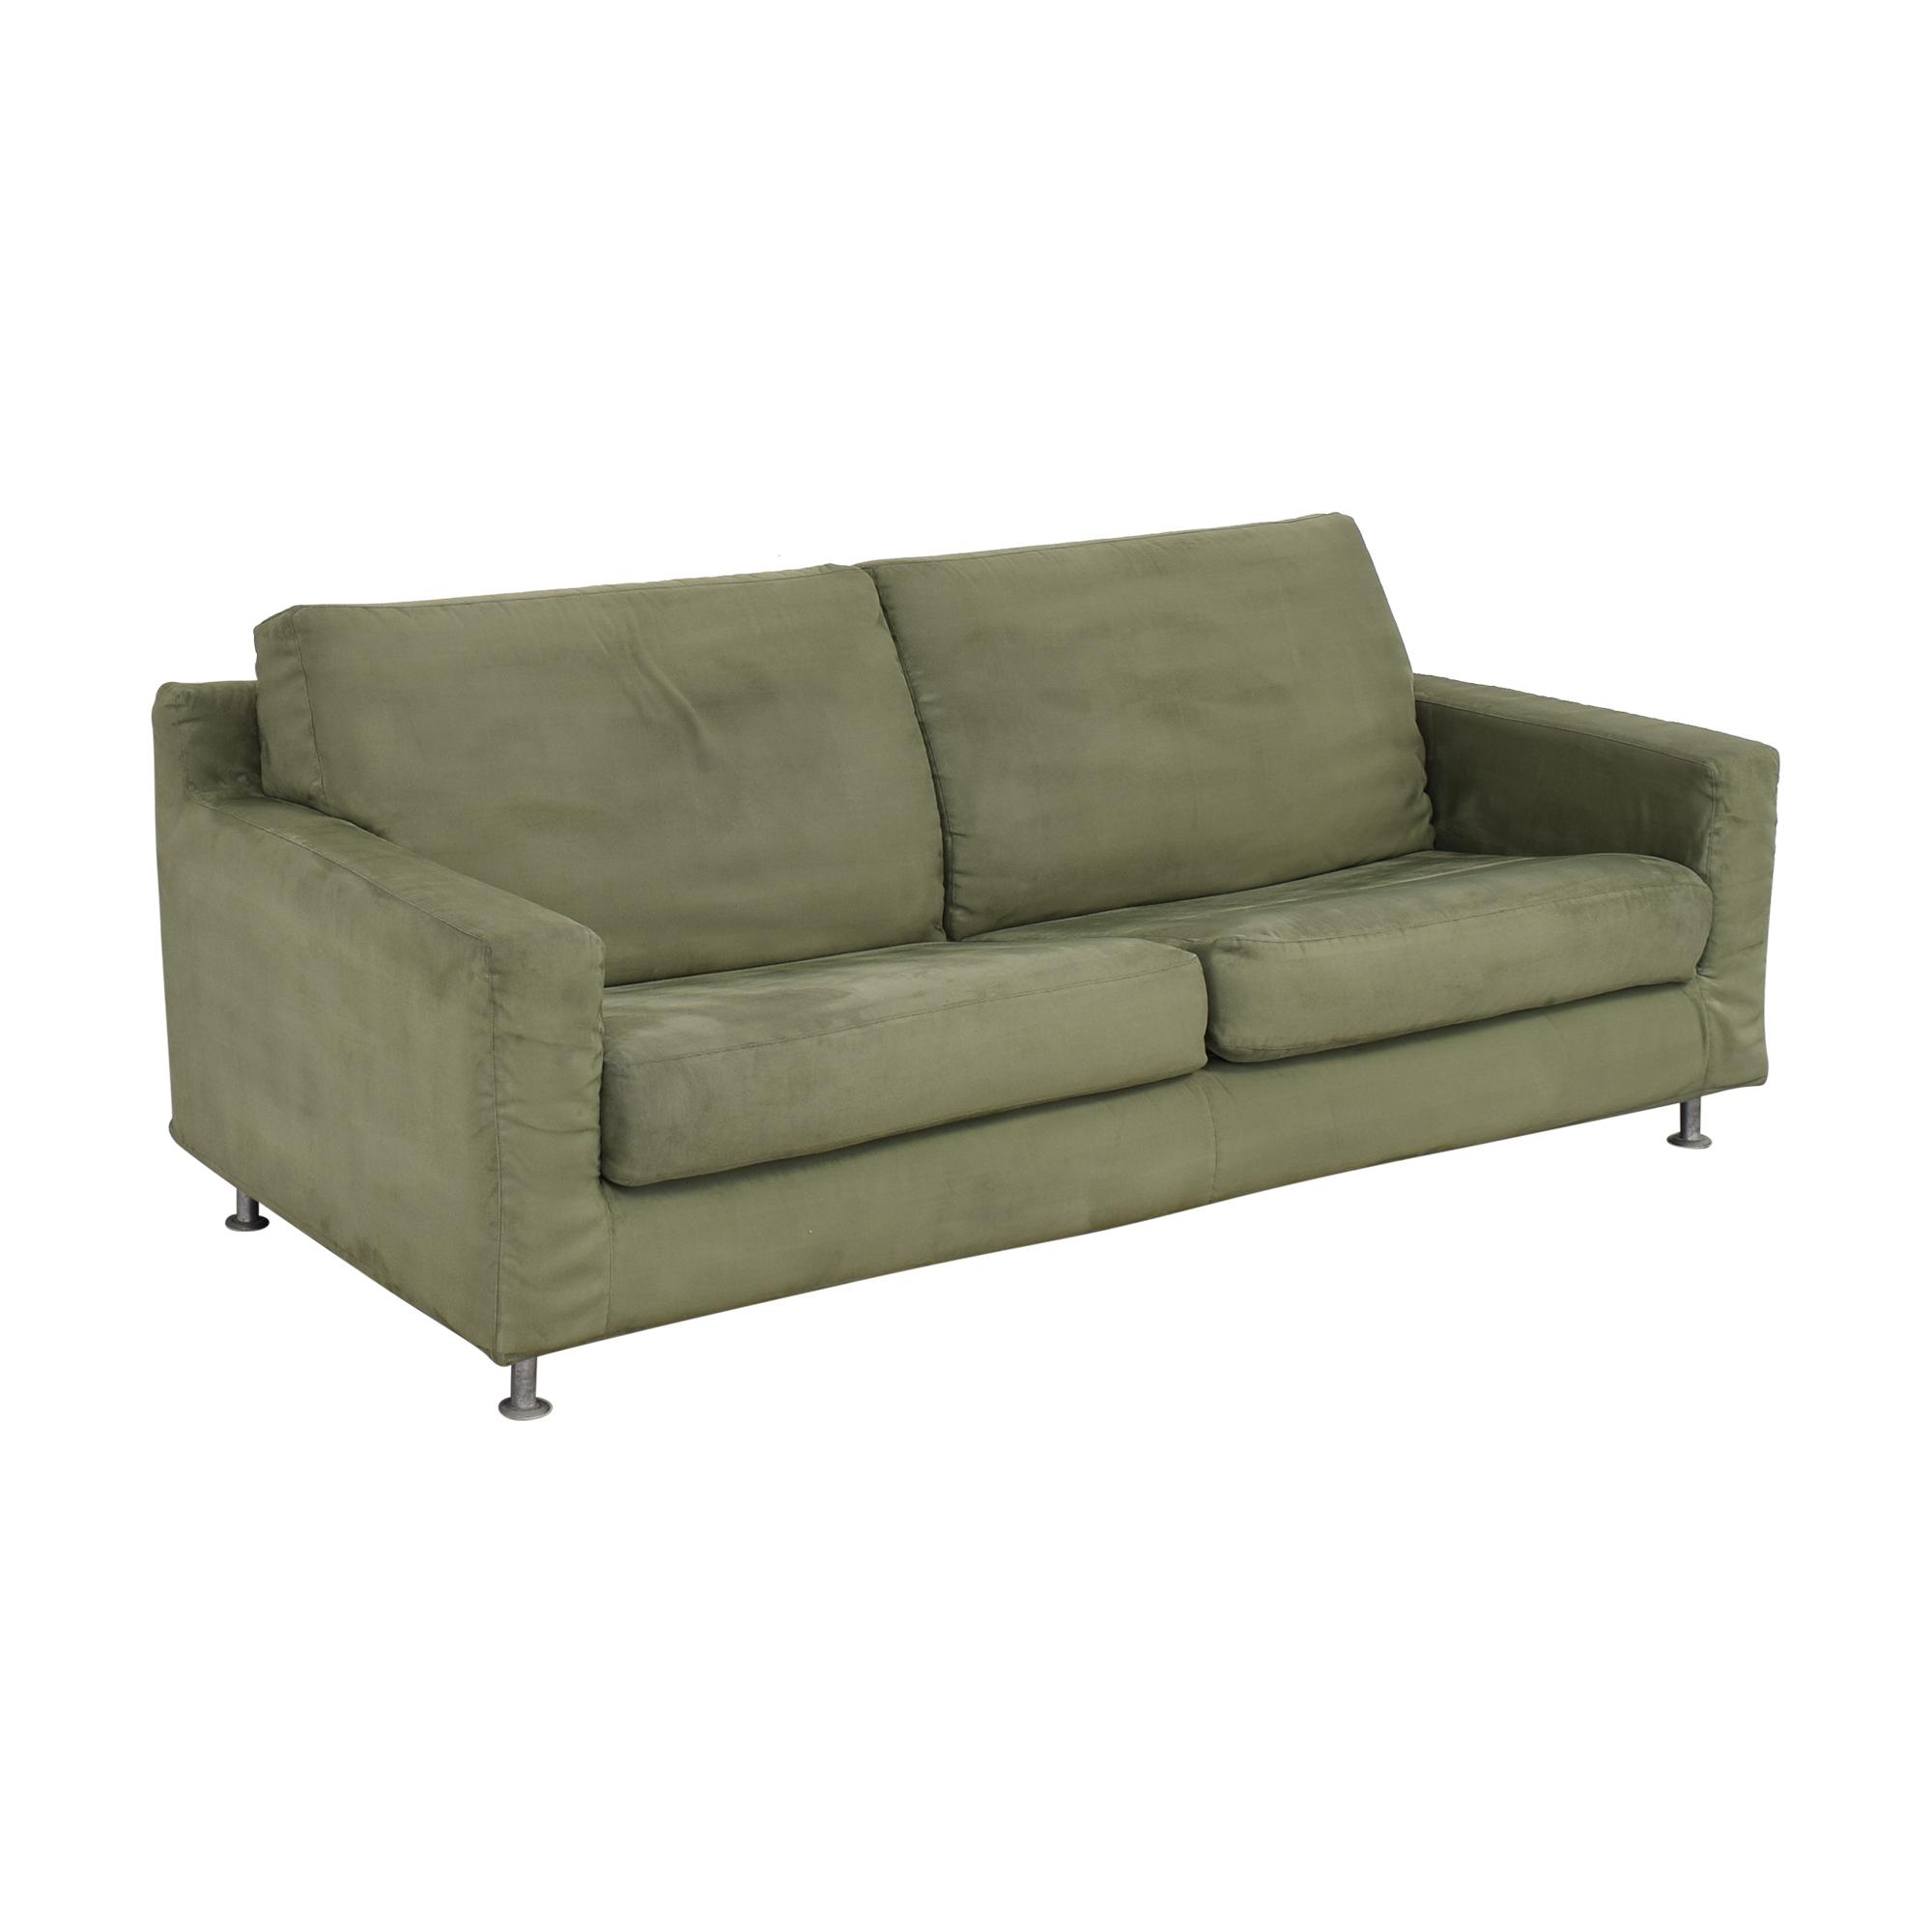 buy Maurice Villency Sofa Bed Maurice Villency Sofa Beds